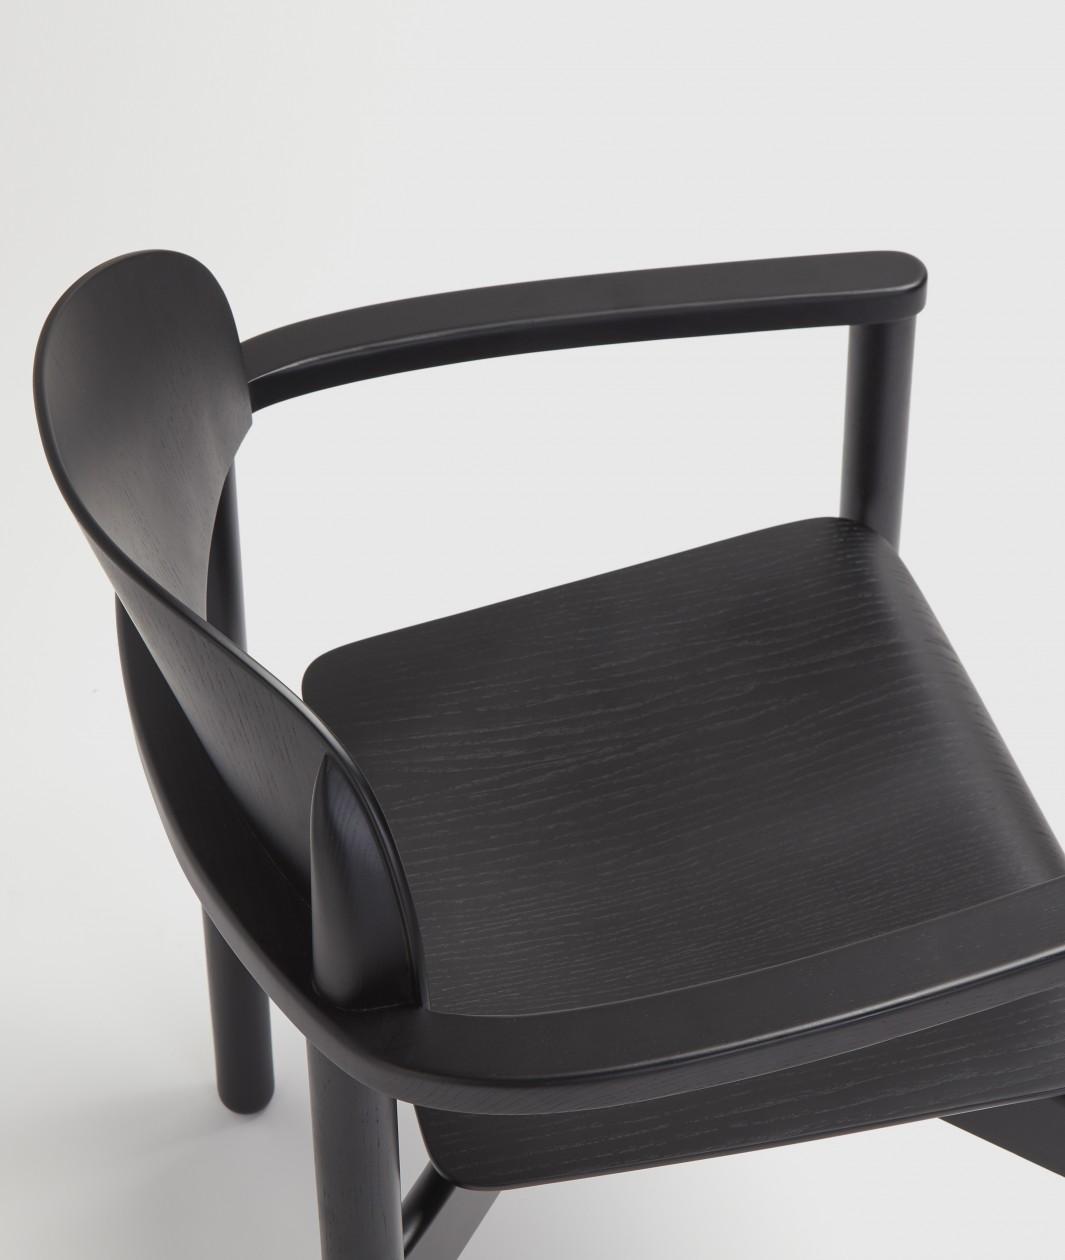 Strange Arc Alain Gilles Pabps2019 Chair Design Images Pabps2019Com